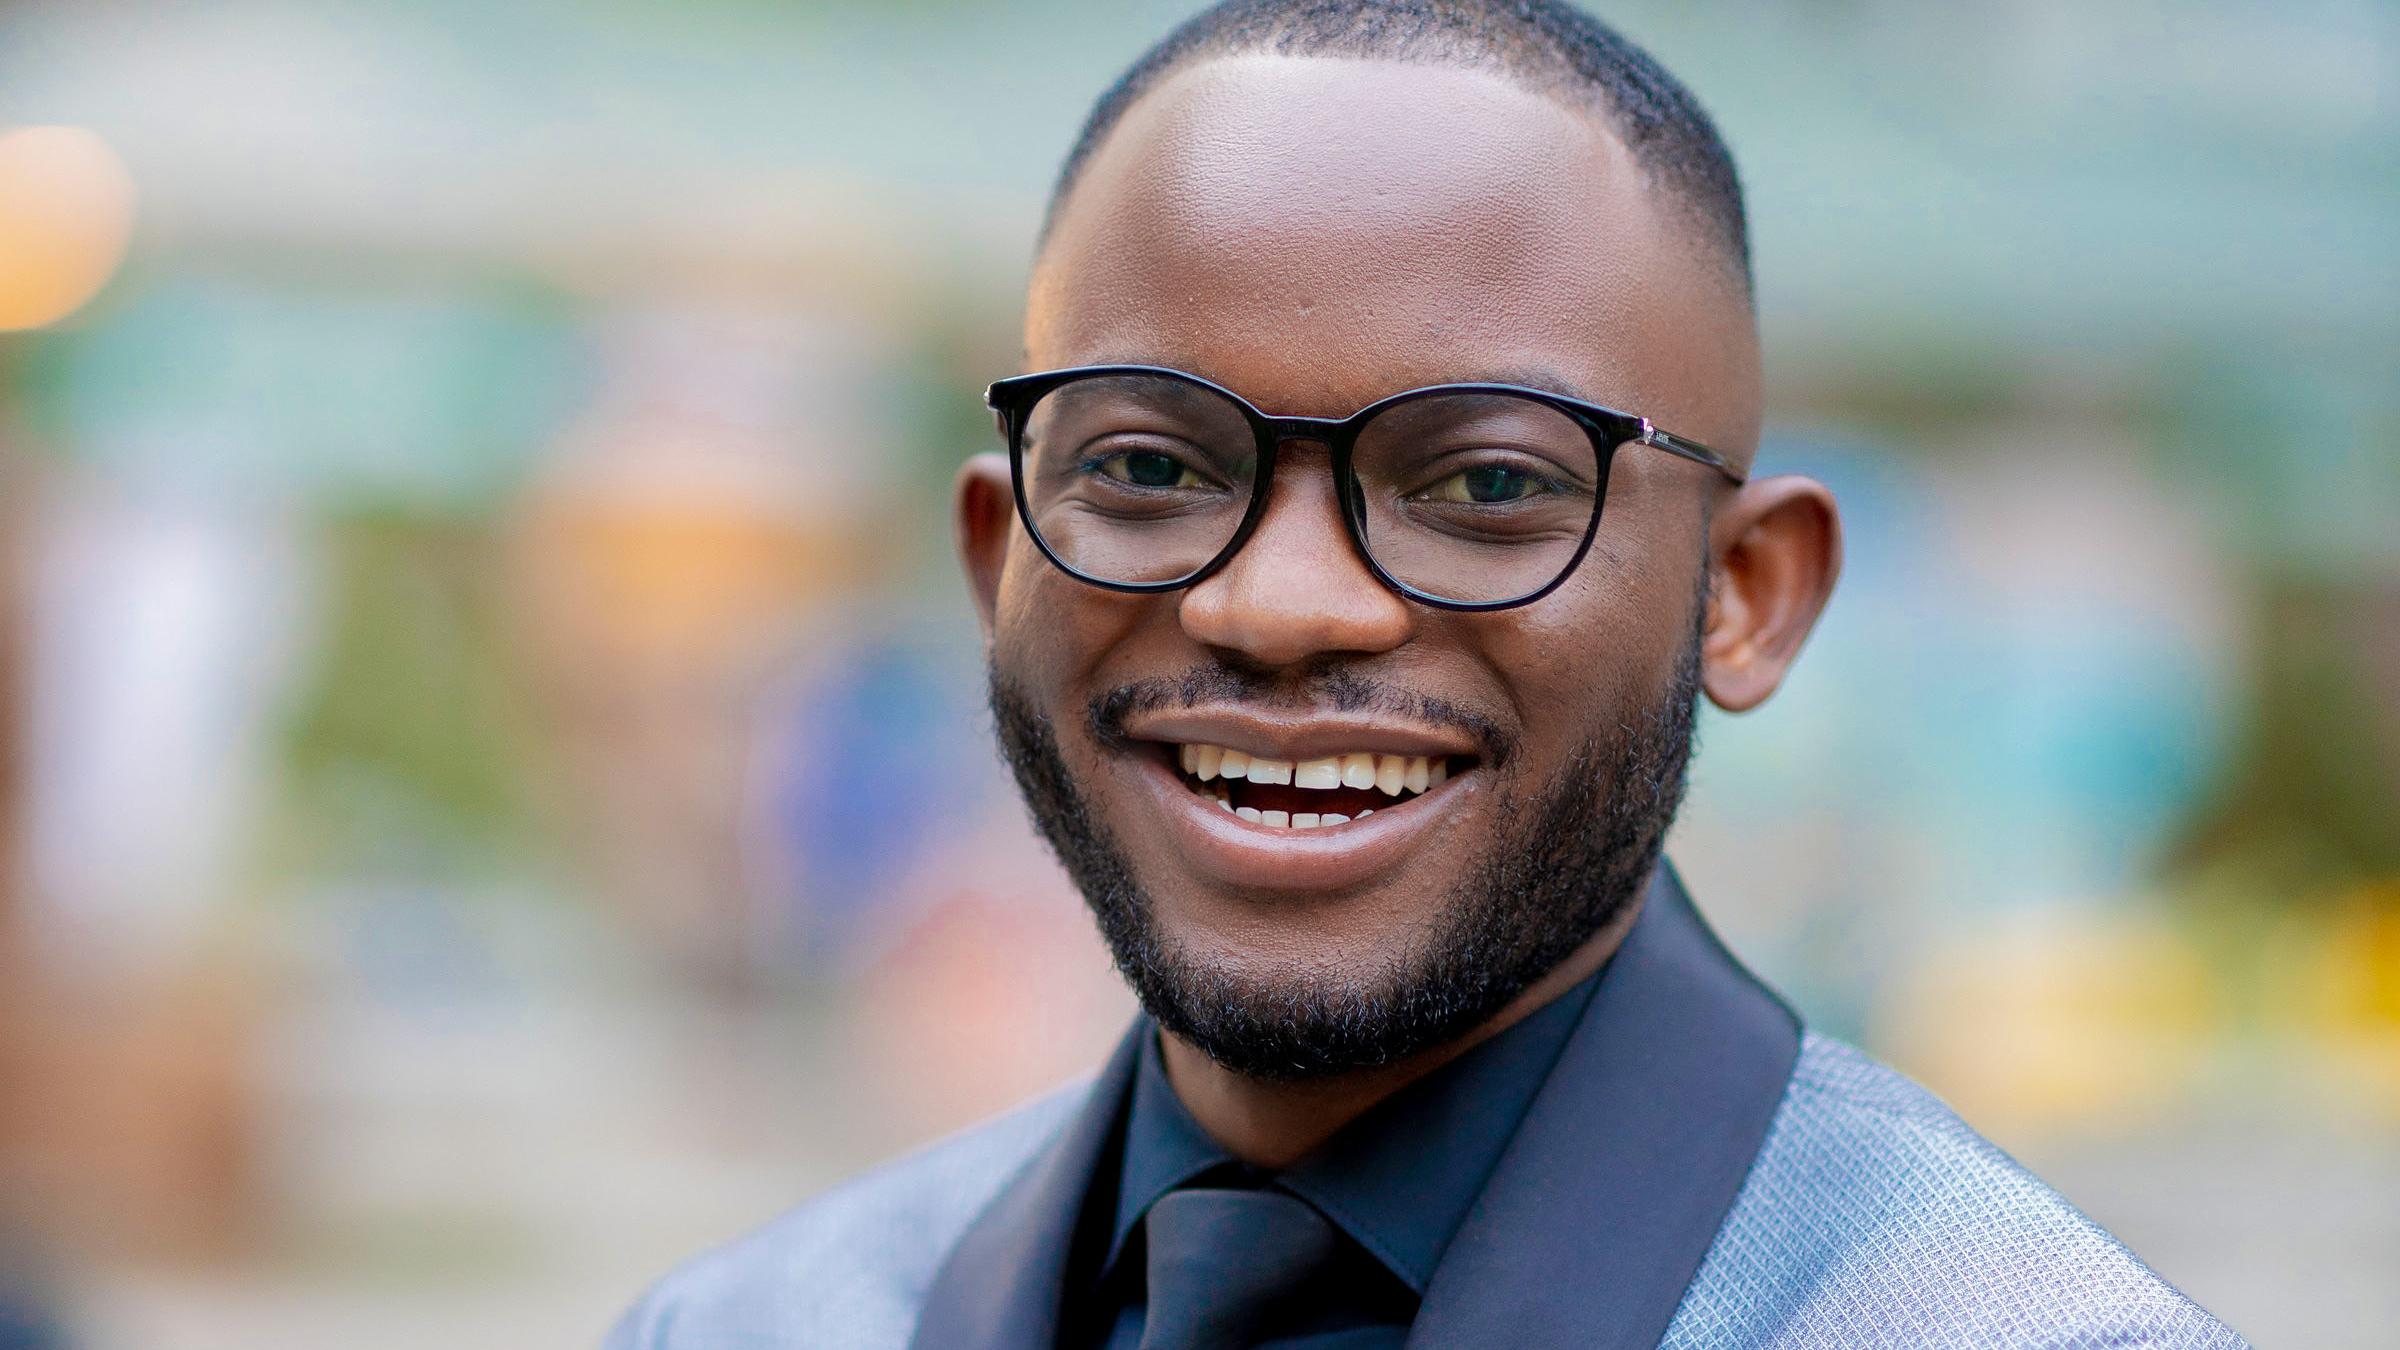 SDSN Youth announces Brighton Kaoma as Global Director